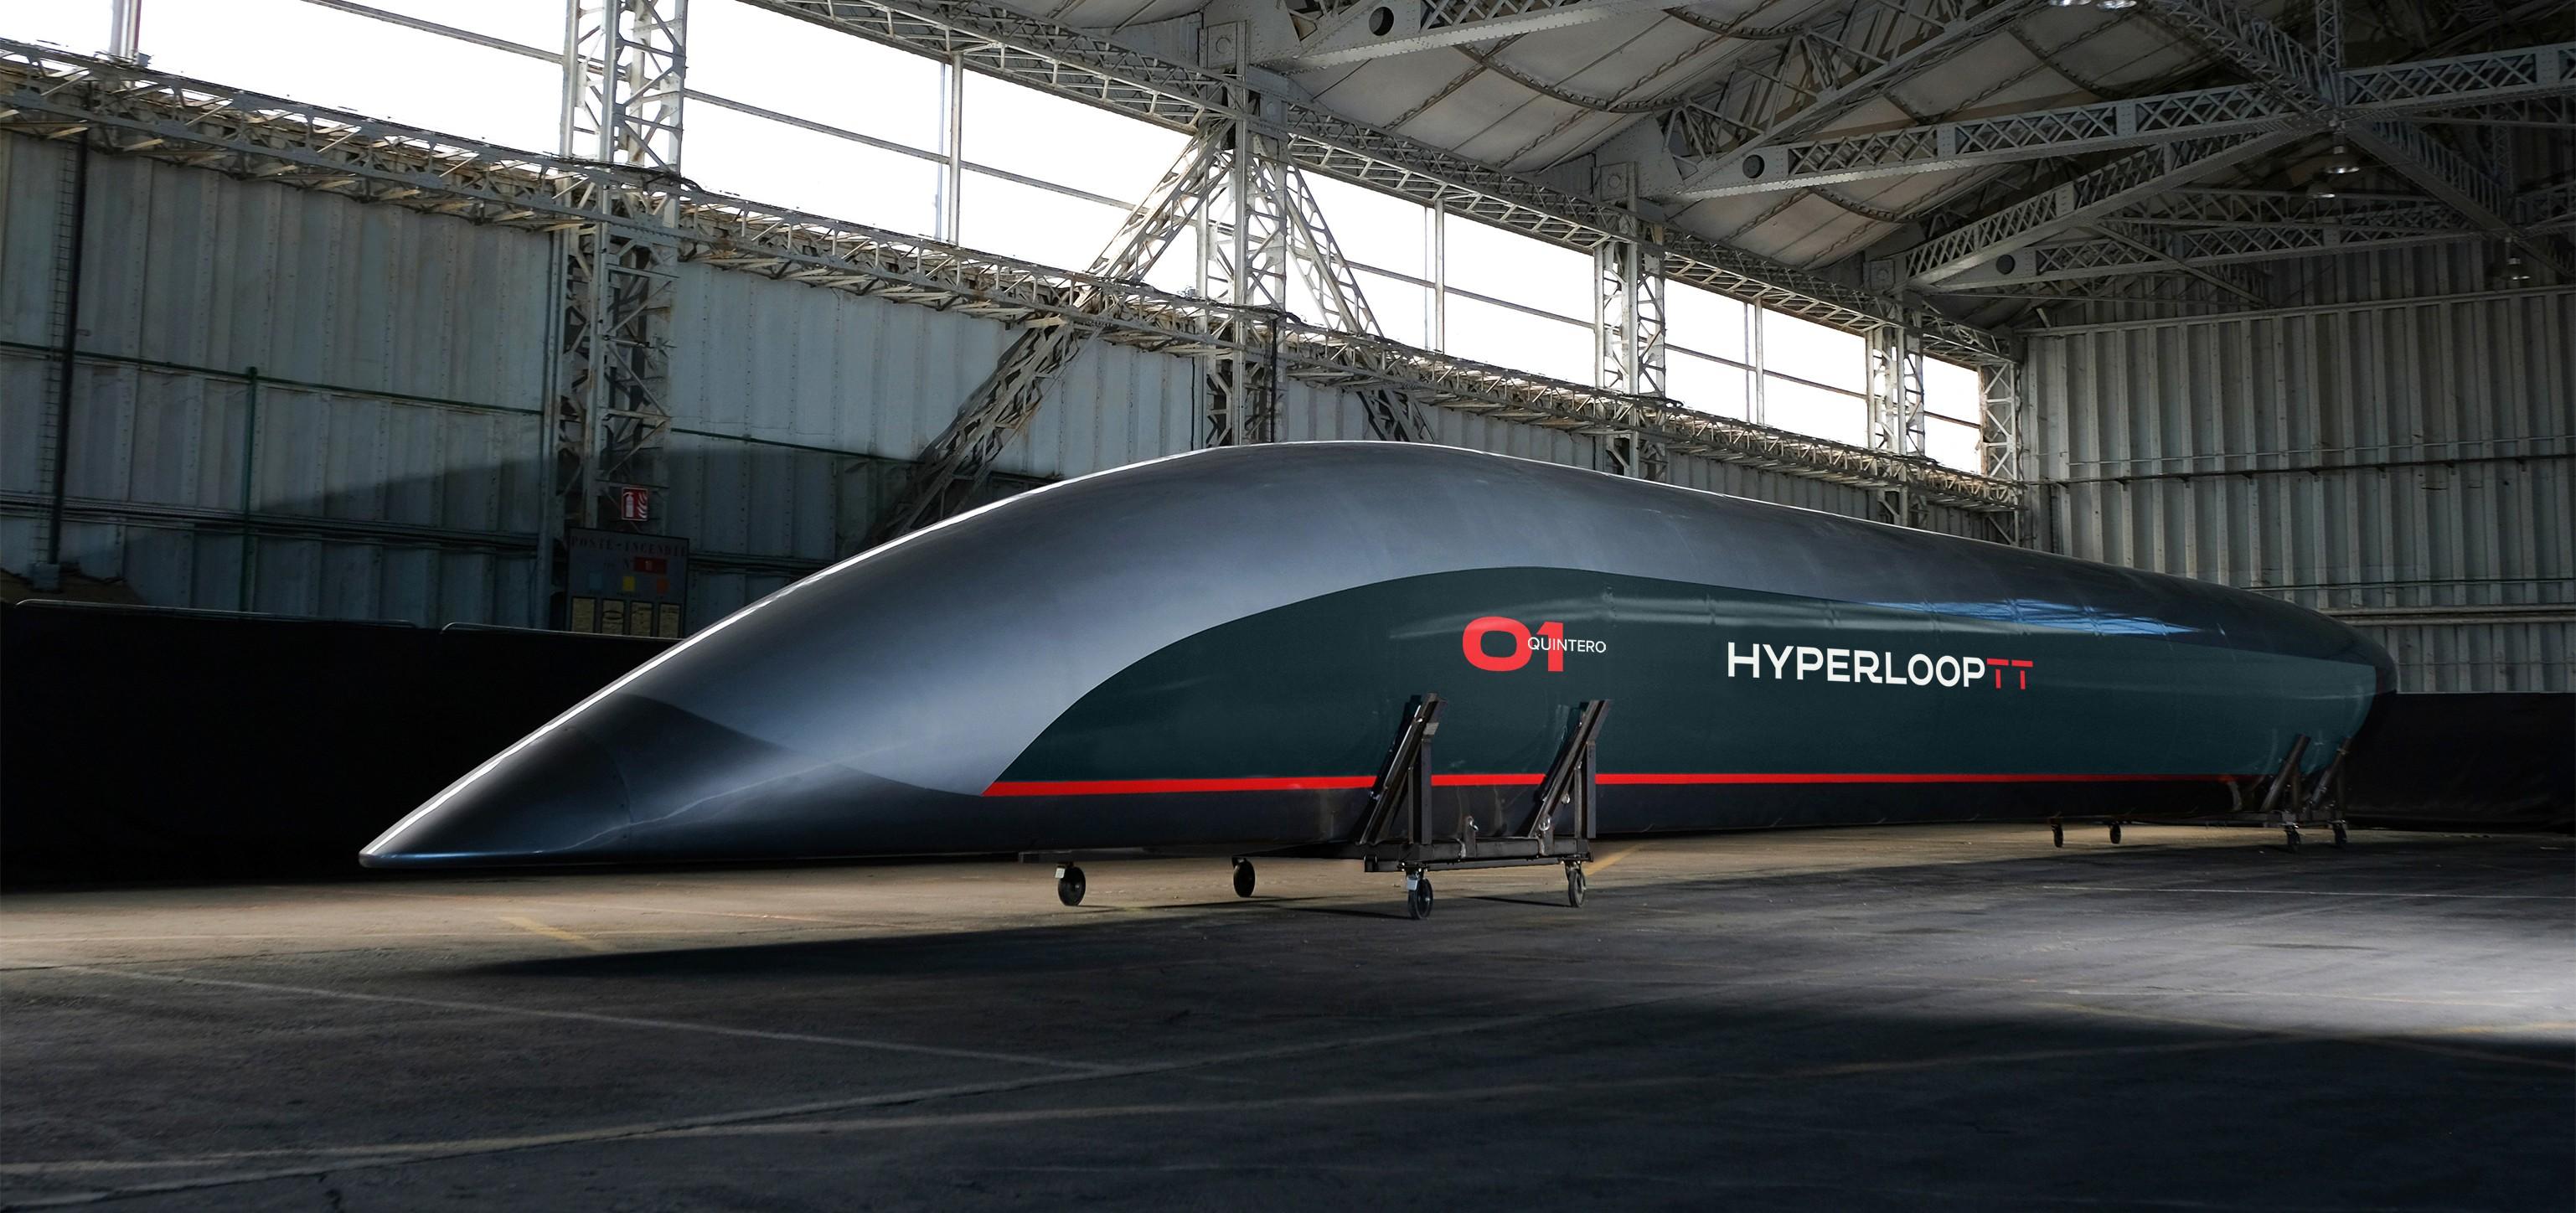 Альтернативний транспорт Hyperloop (фото: www.hyperlooptt.com)